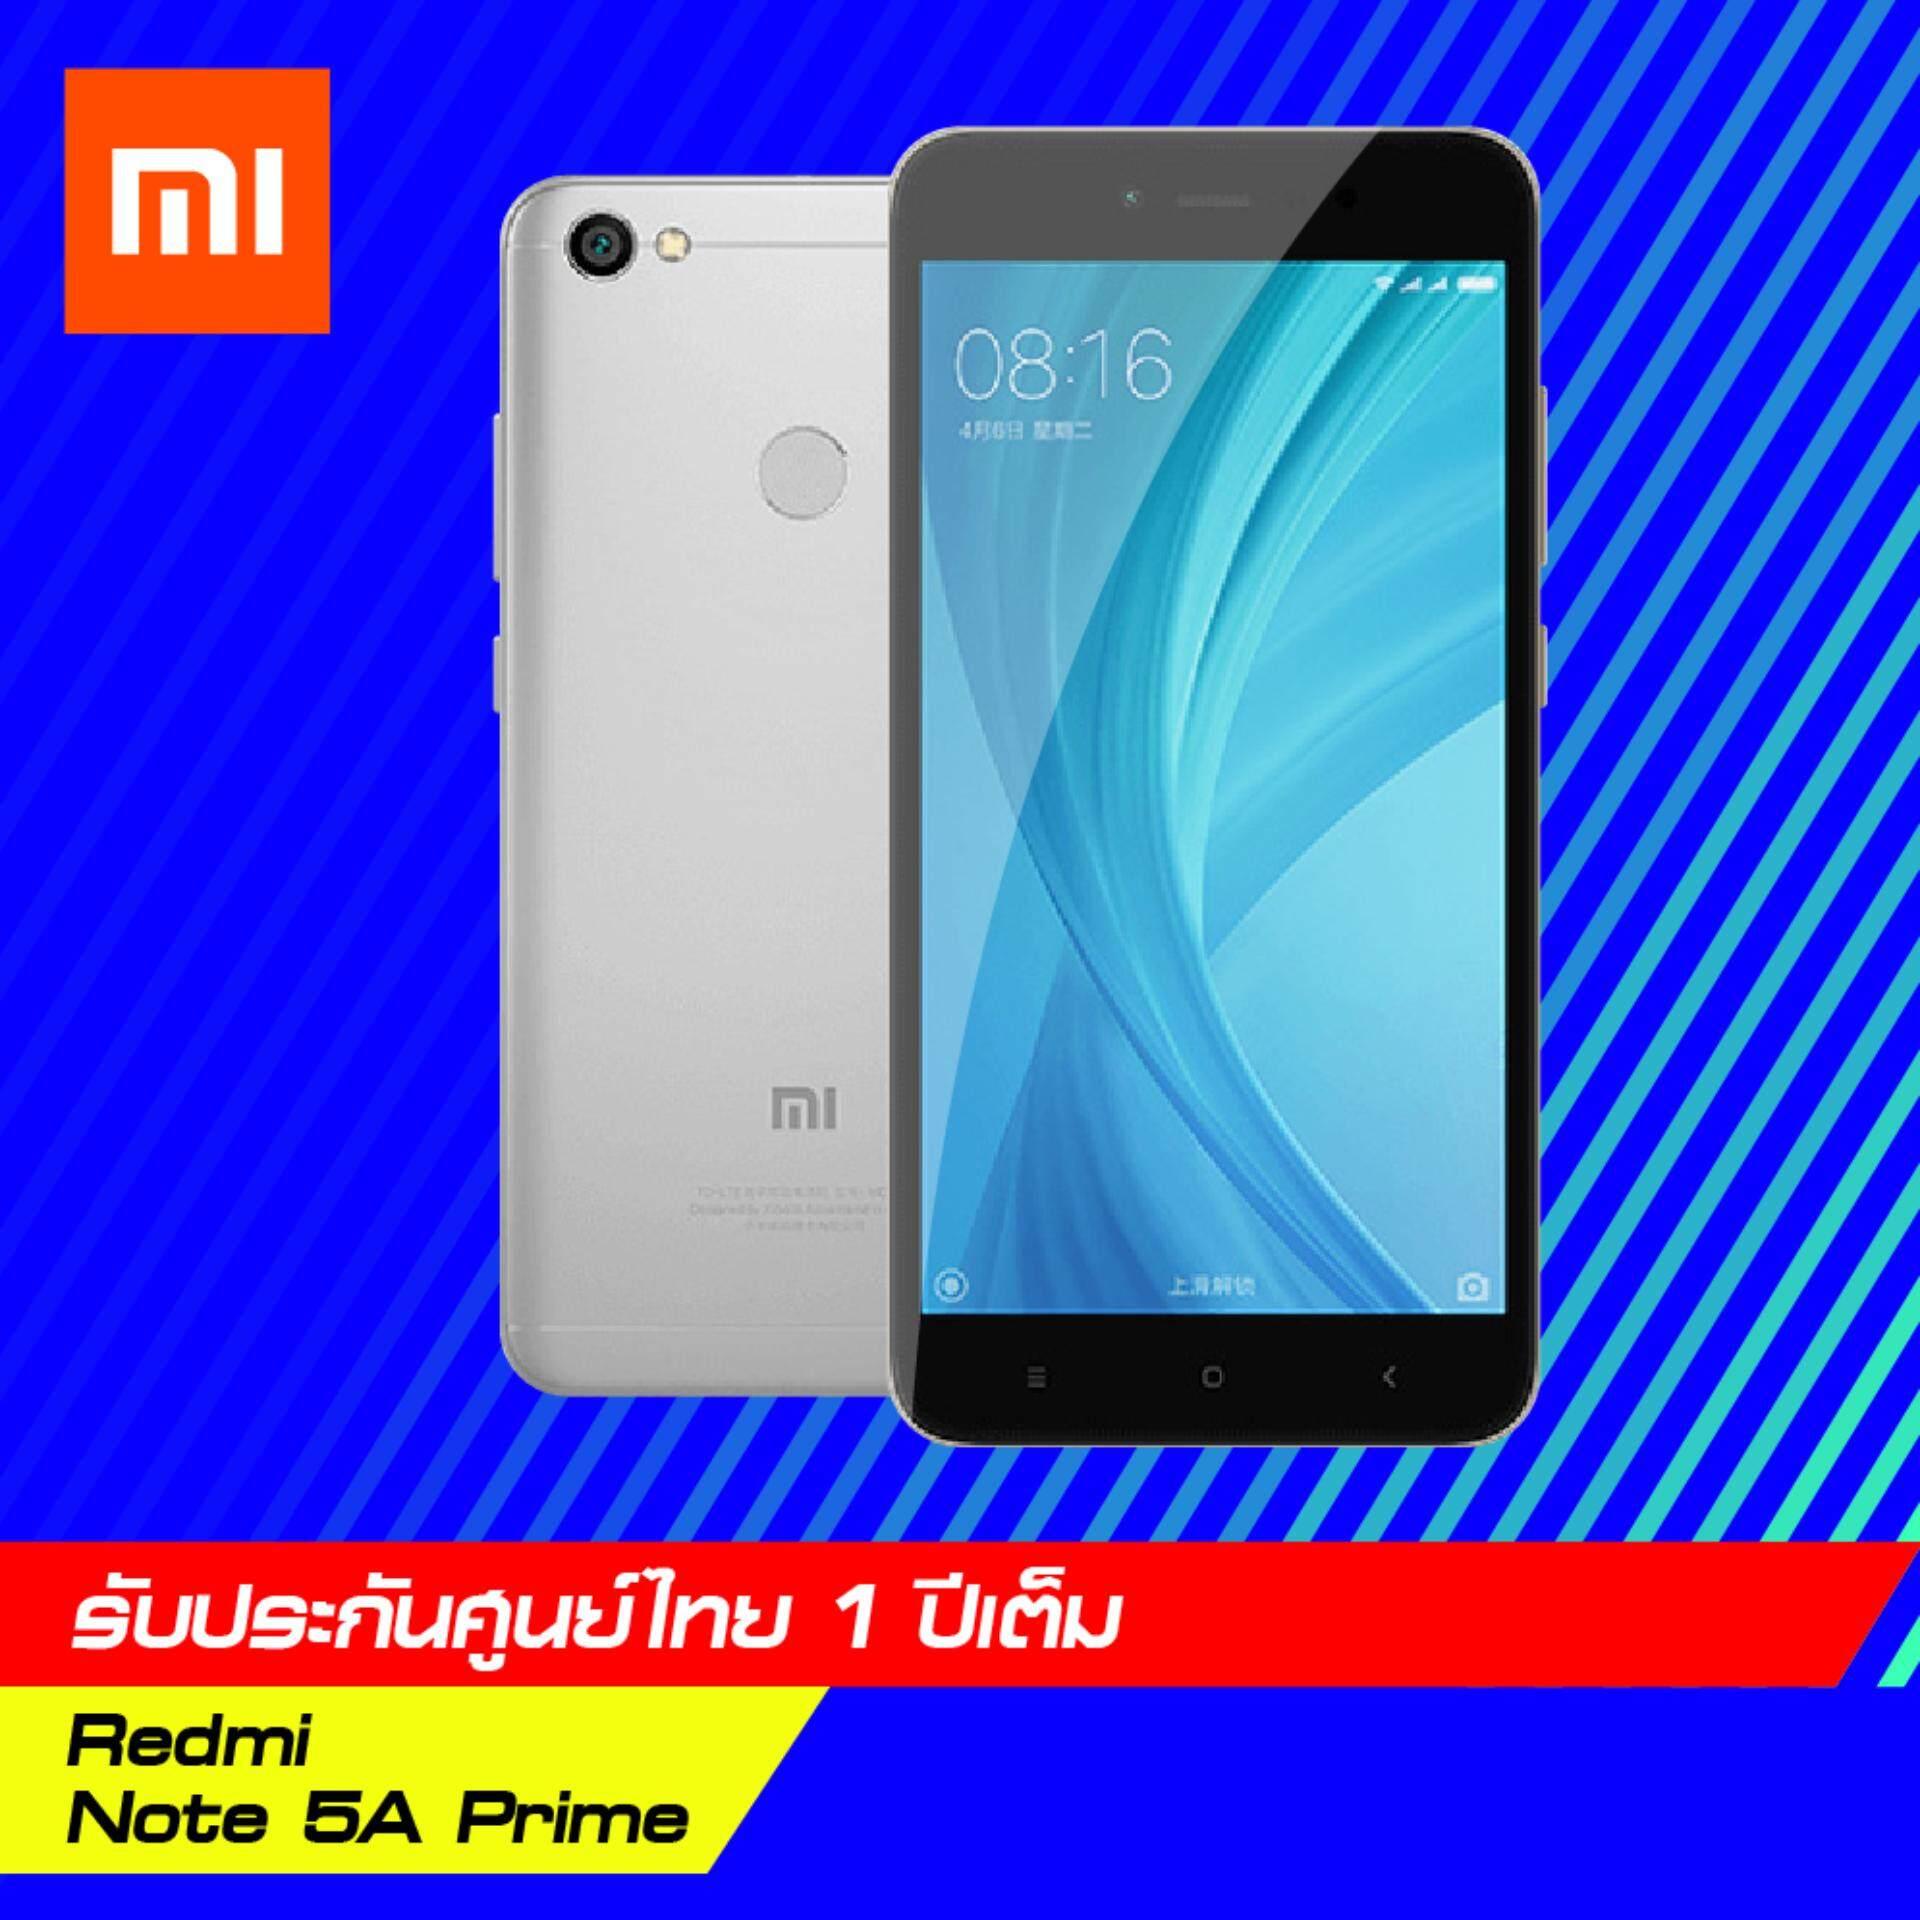 Xiaomi Redmi Note 5A Prime (3/32GB) พร้อมฟิล์มกันรอย มูลค่า 199.- [[ รับประกันศูนย์ไทย 1 ปีเต็ม!! ]]